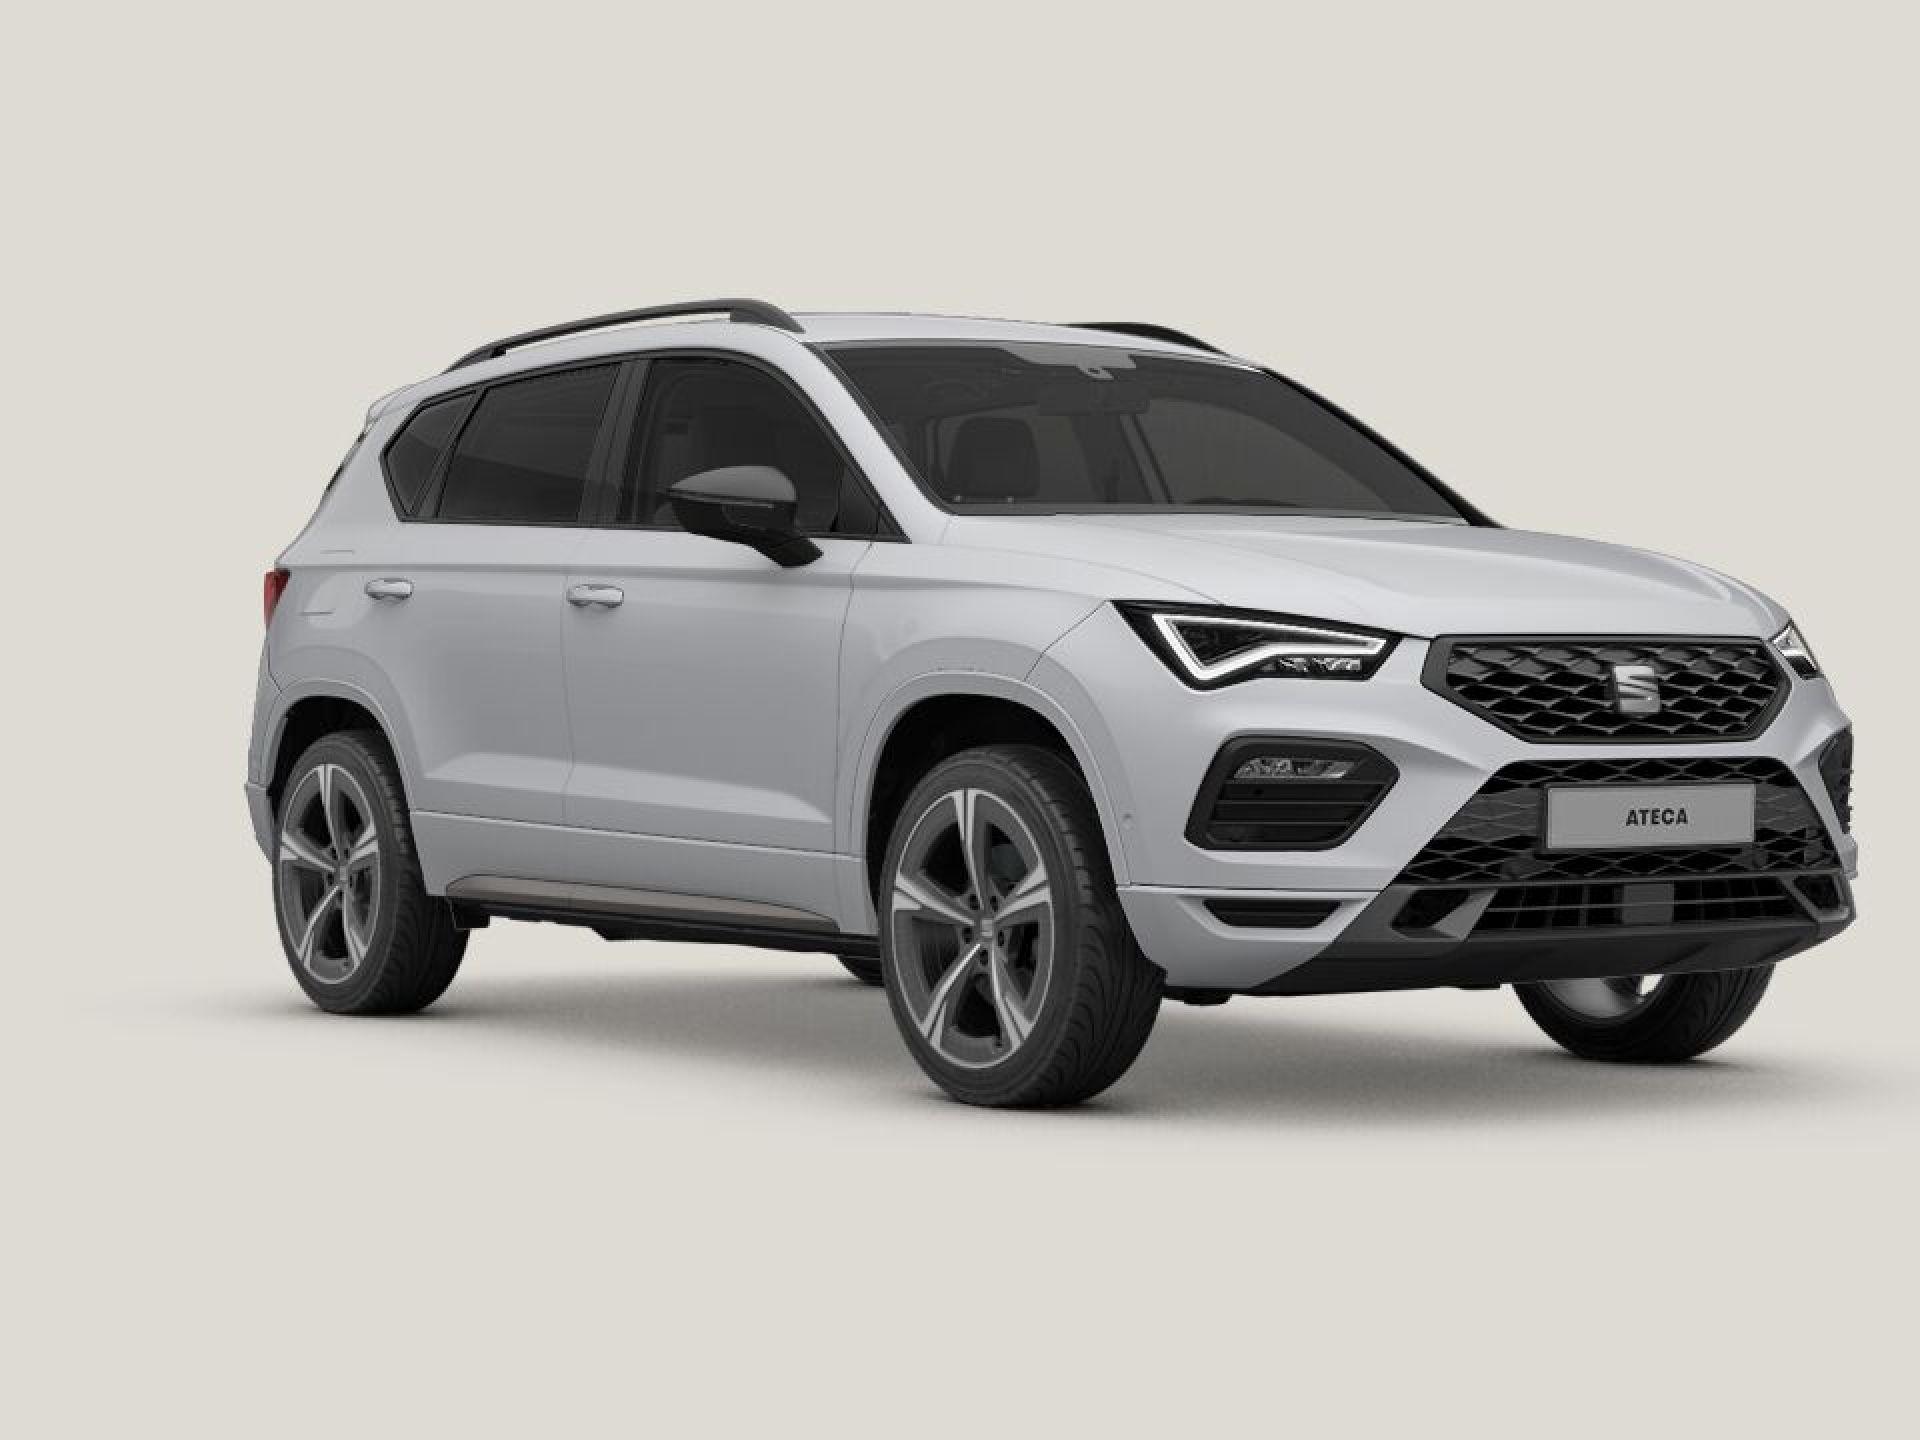 SEAT Ateca 1.5 TSI 110kW (150CV) DSG S&S FR Go nuevo Madrid